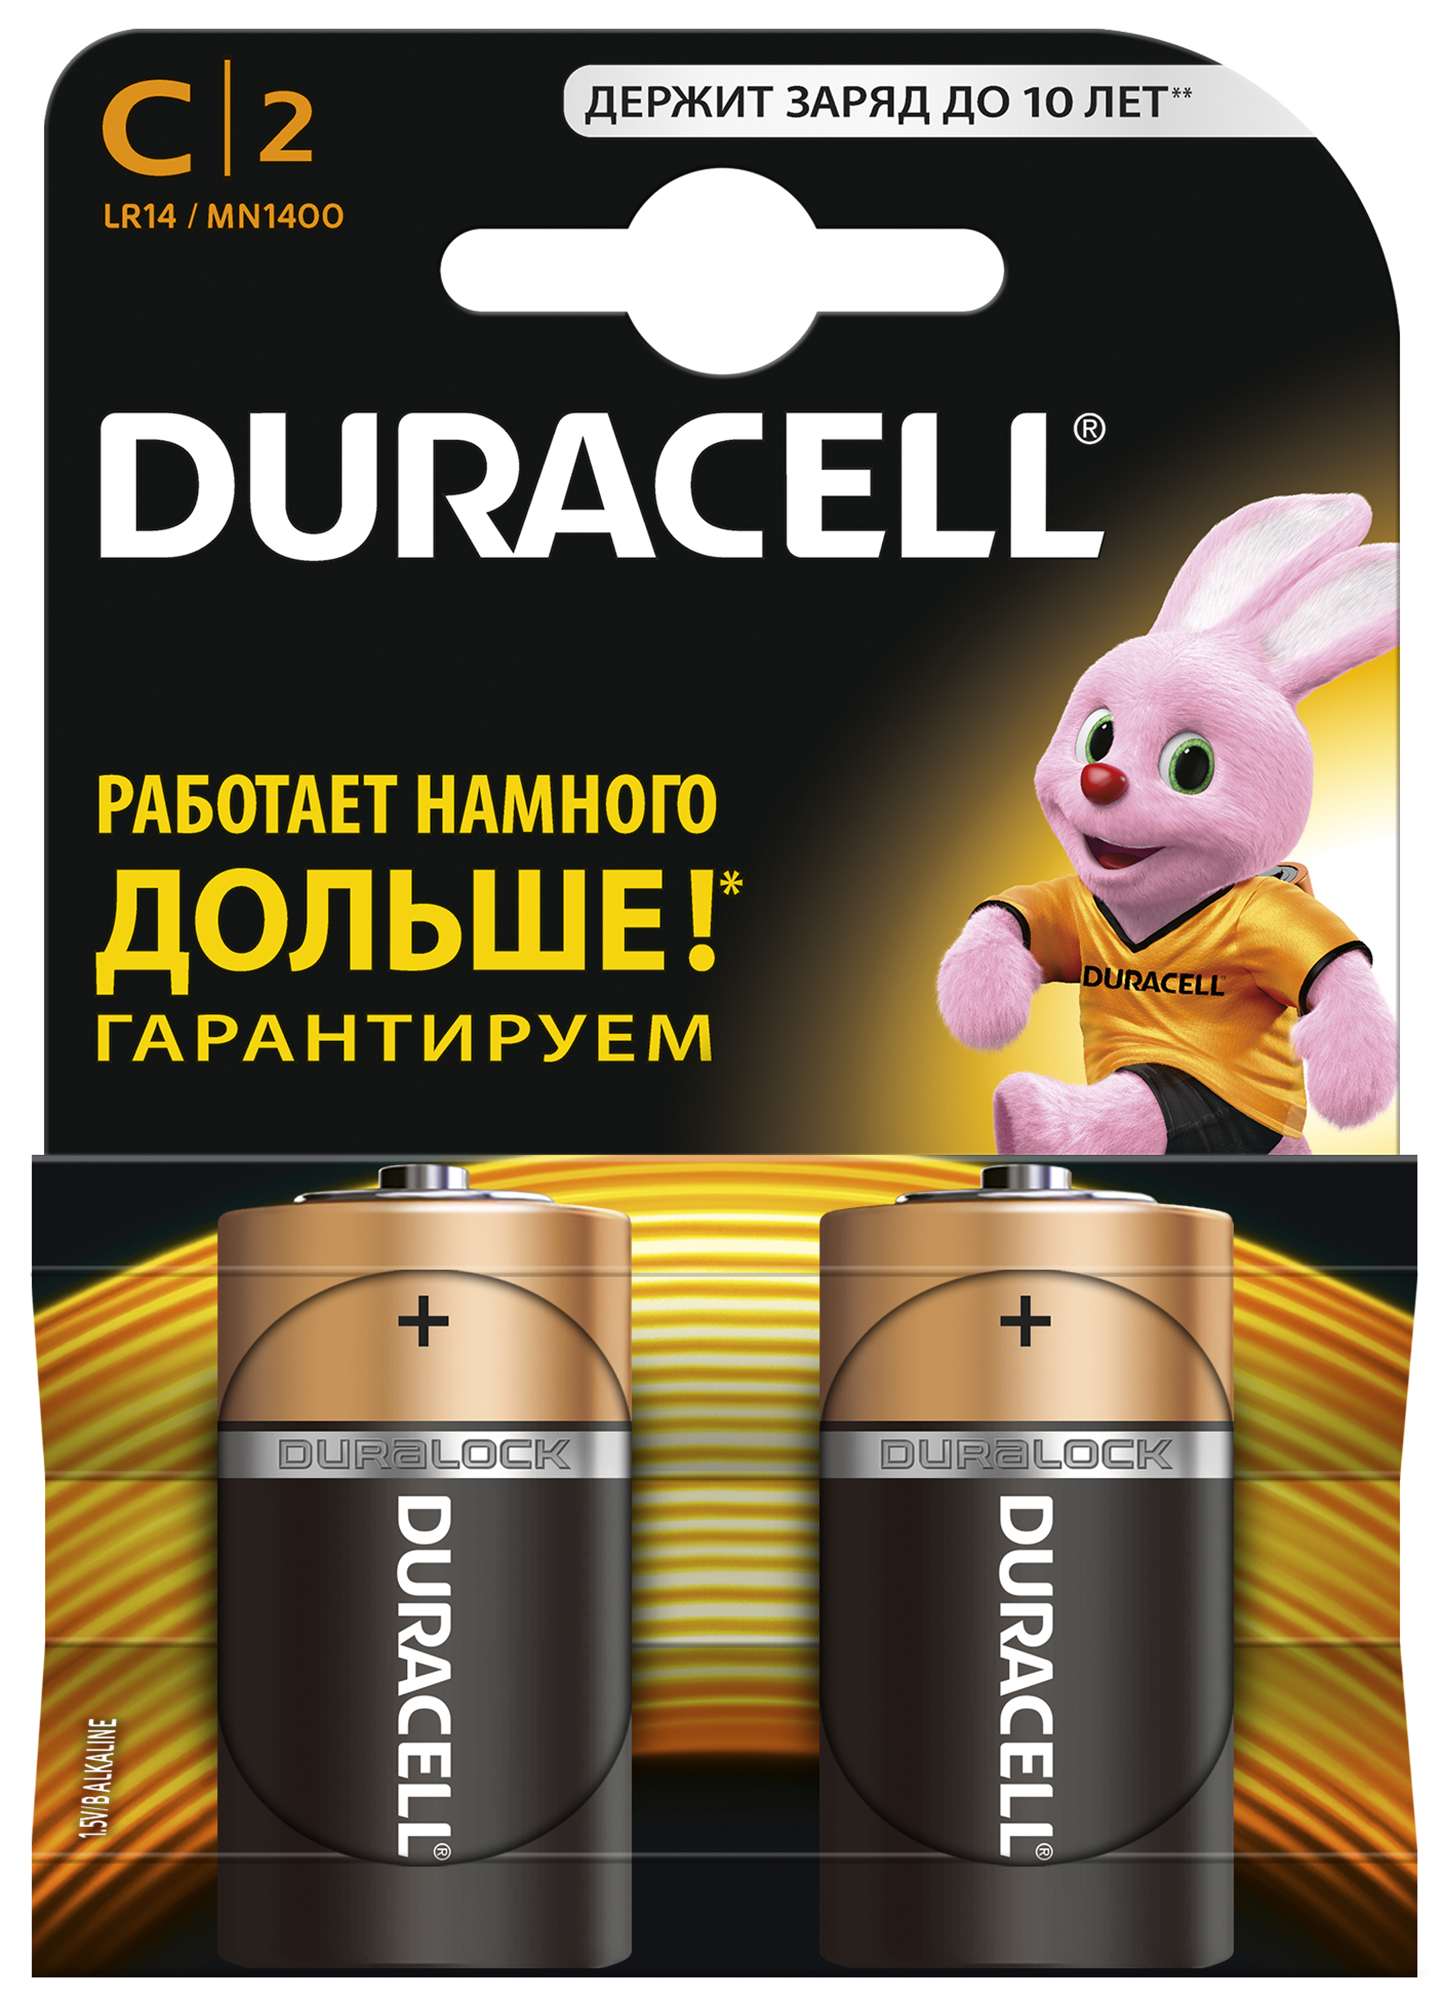 Duracell Батарейки щелочные Basic C/LR14, 2 шт.